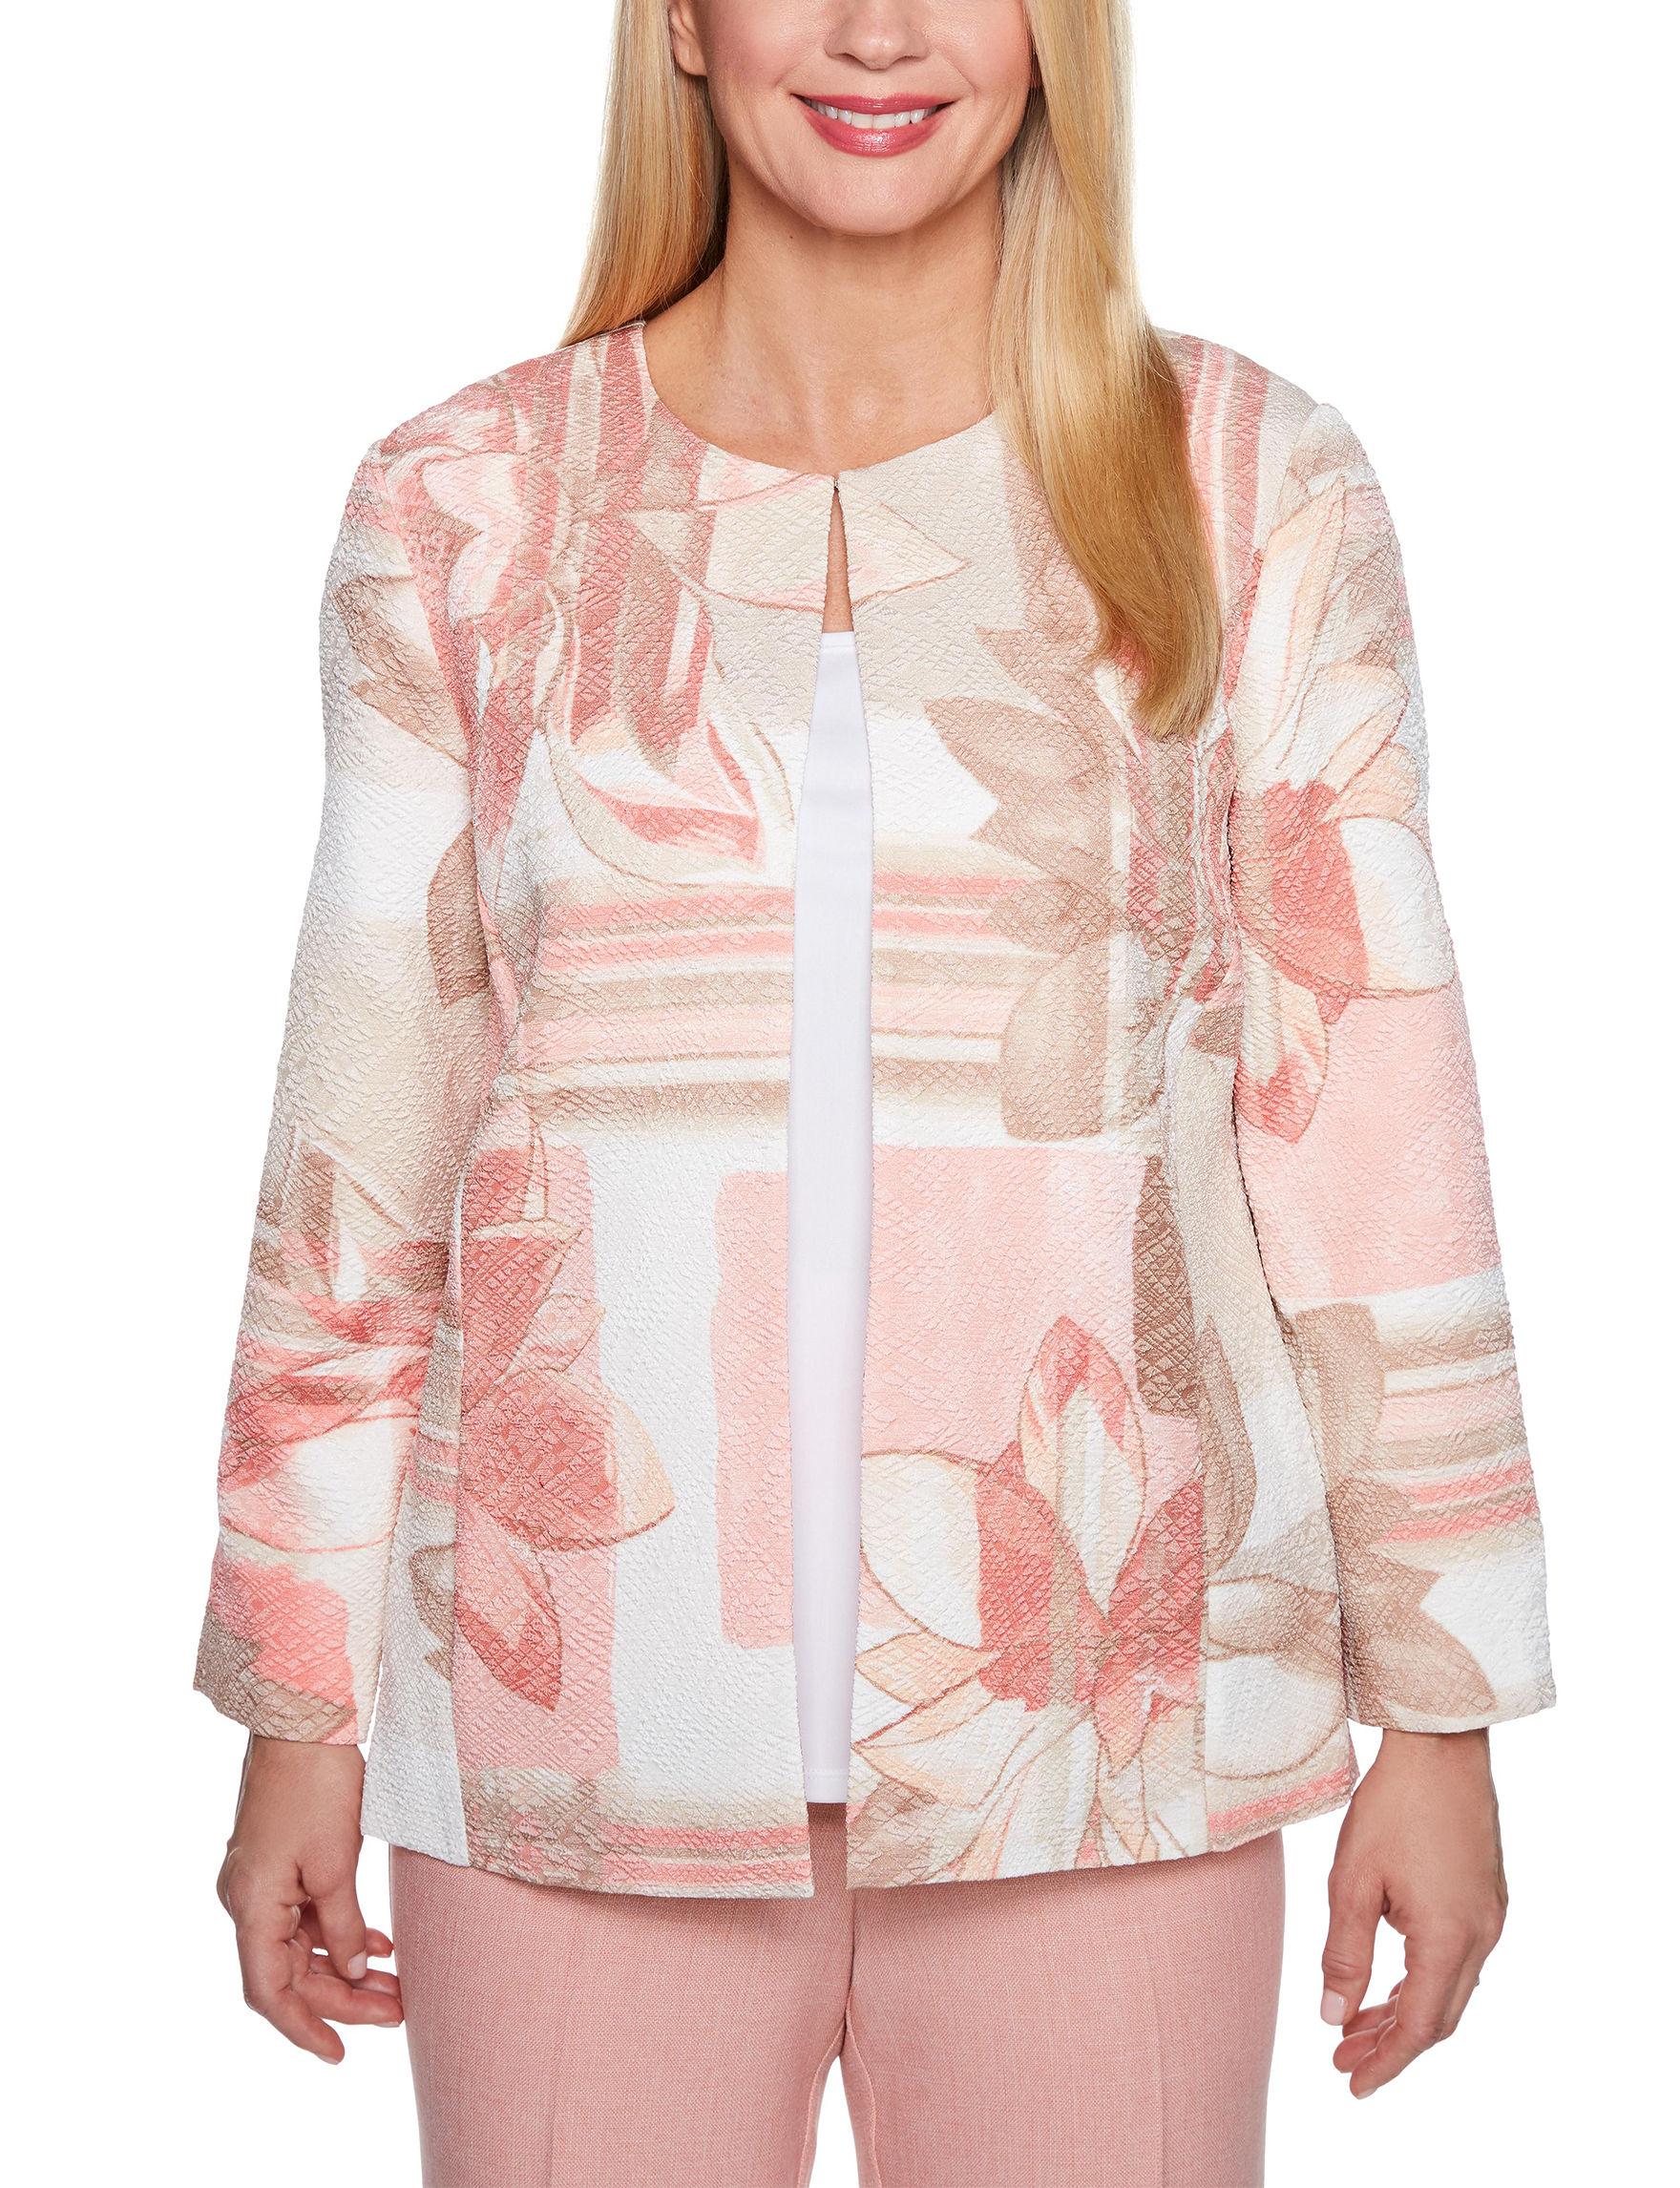 Alfred Dunner Beige Floral Lightweight Jackets & Blazers